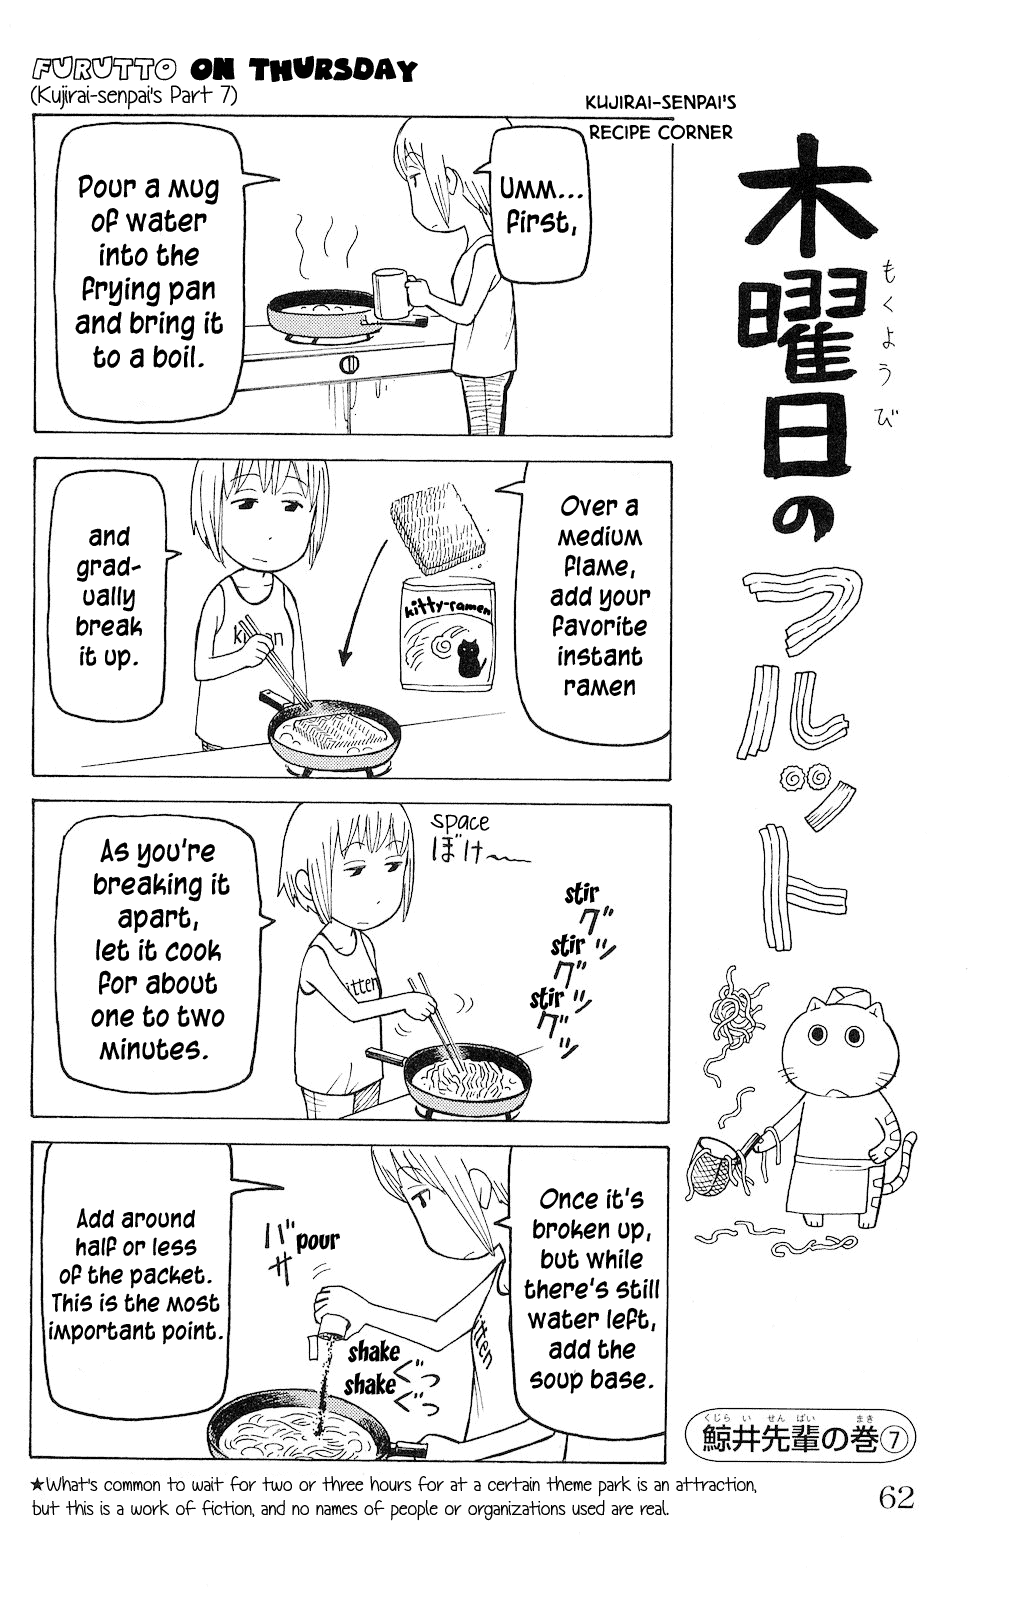 Kujirai Ramen Comic